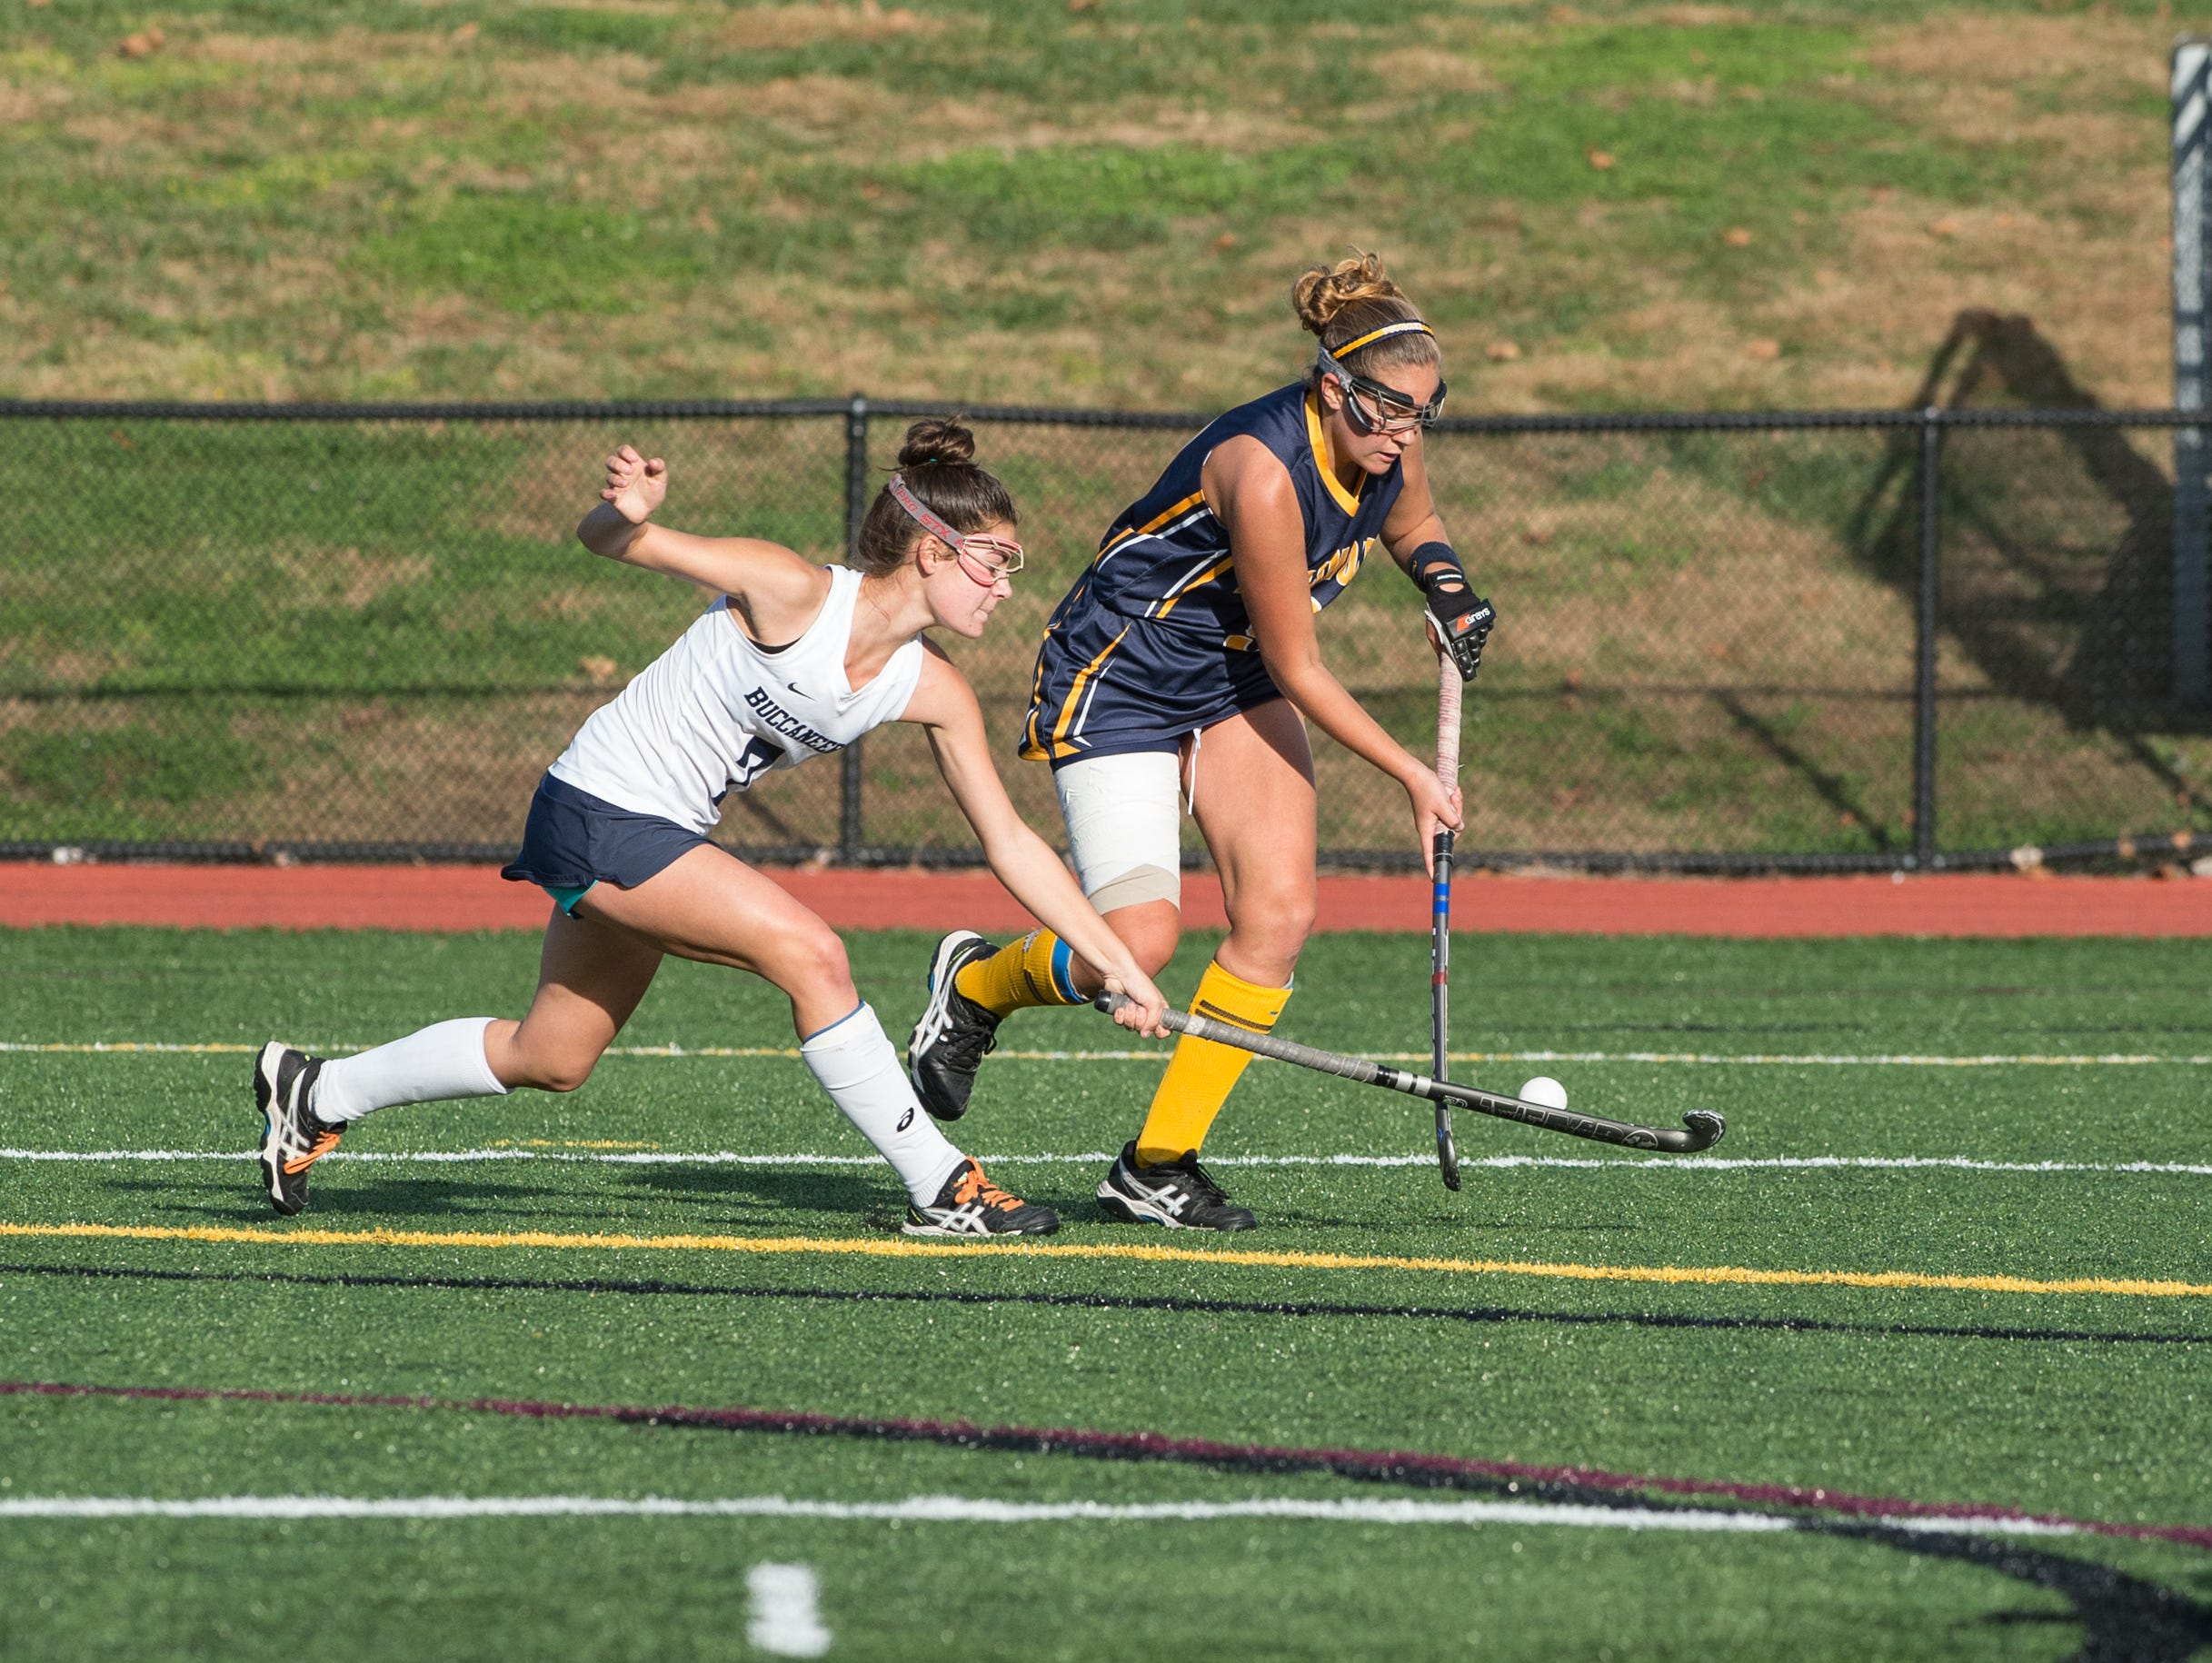 Pocomoke's Dani Batze moves the ball around Kent Island's Nina Cifollili.